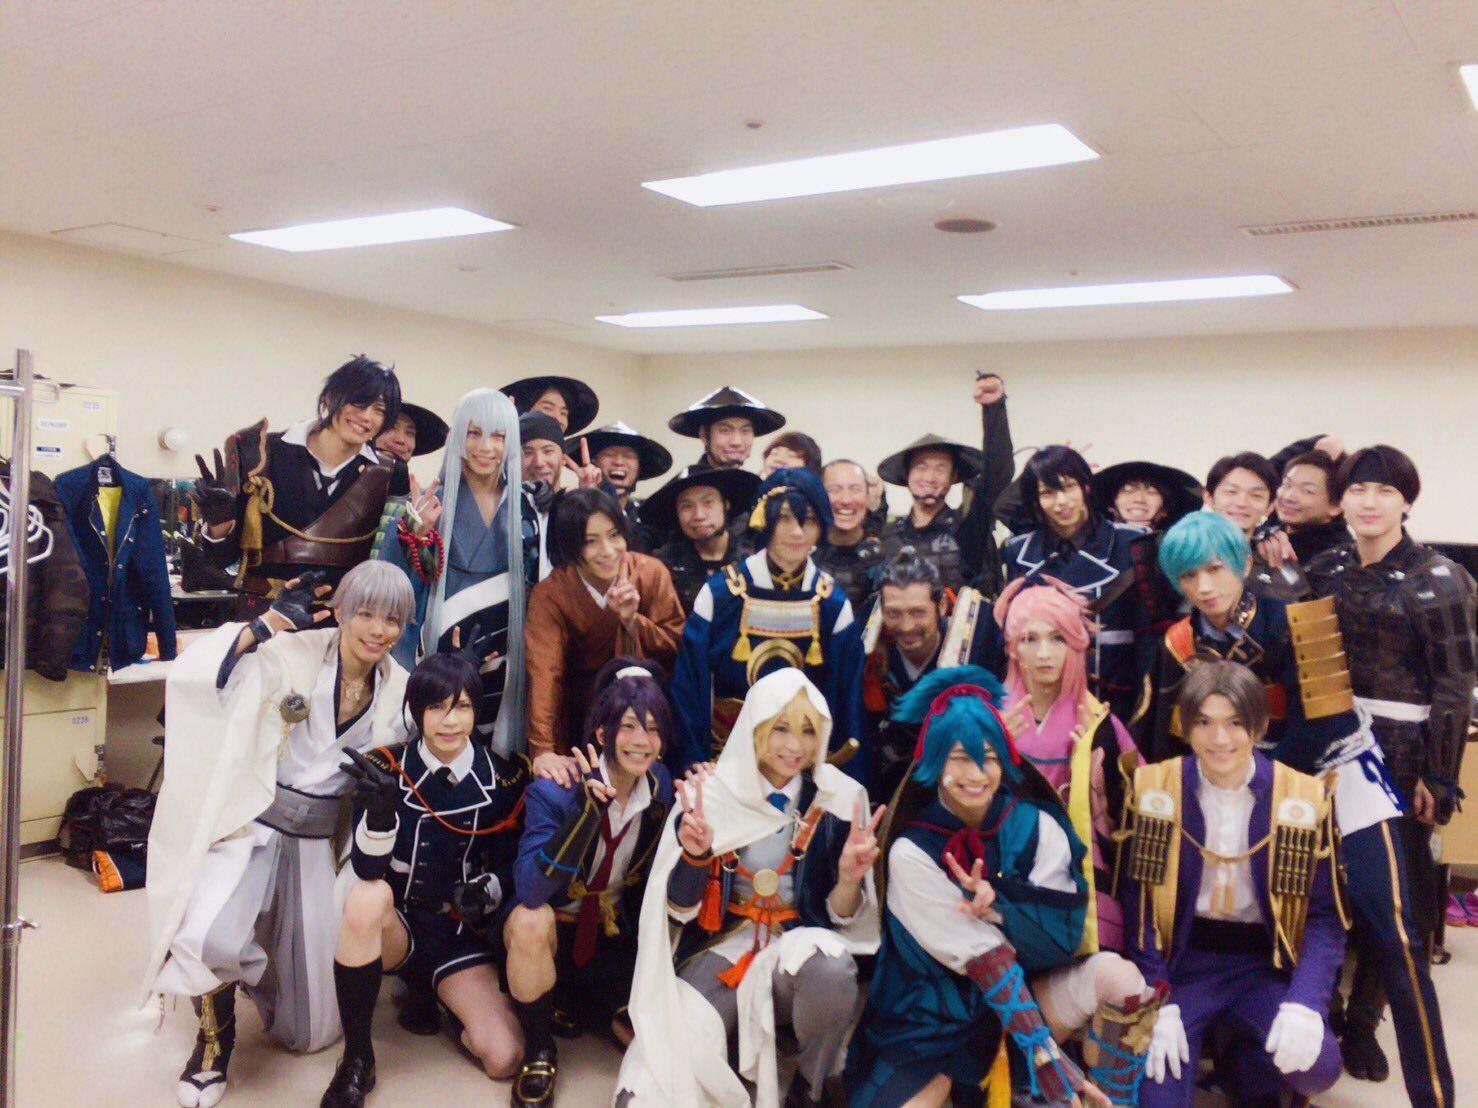 Favorite tweet by @keisuke_higashi : みんなありがとう 最高のメンバーだった https://t.co/CICz4uWlKn